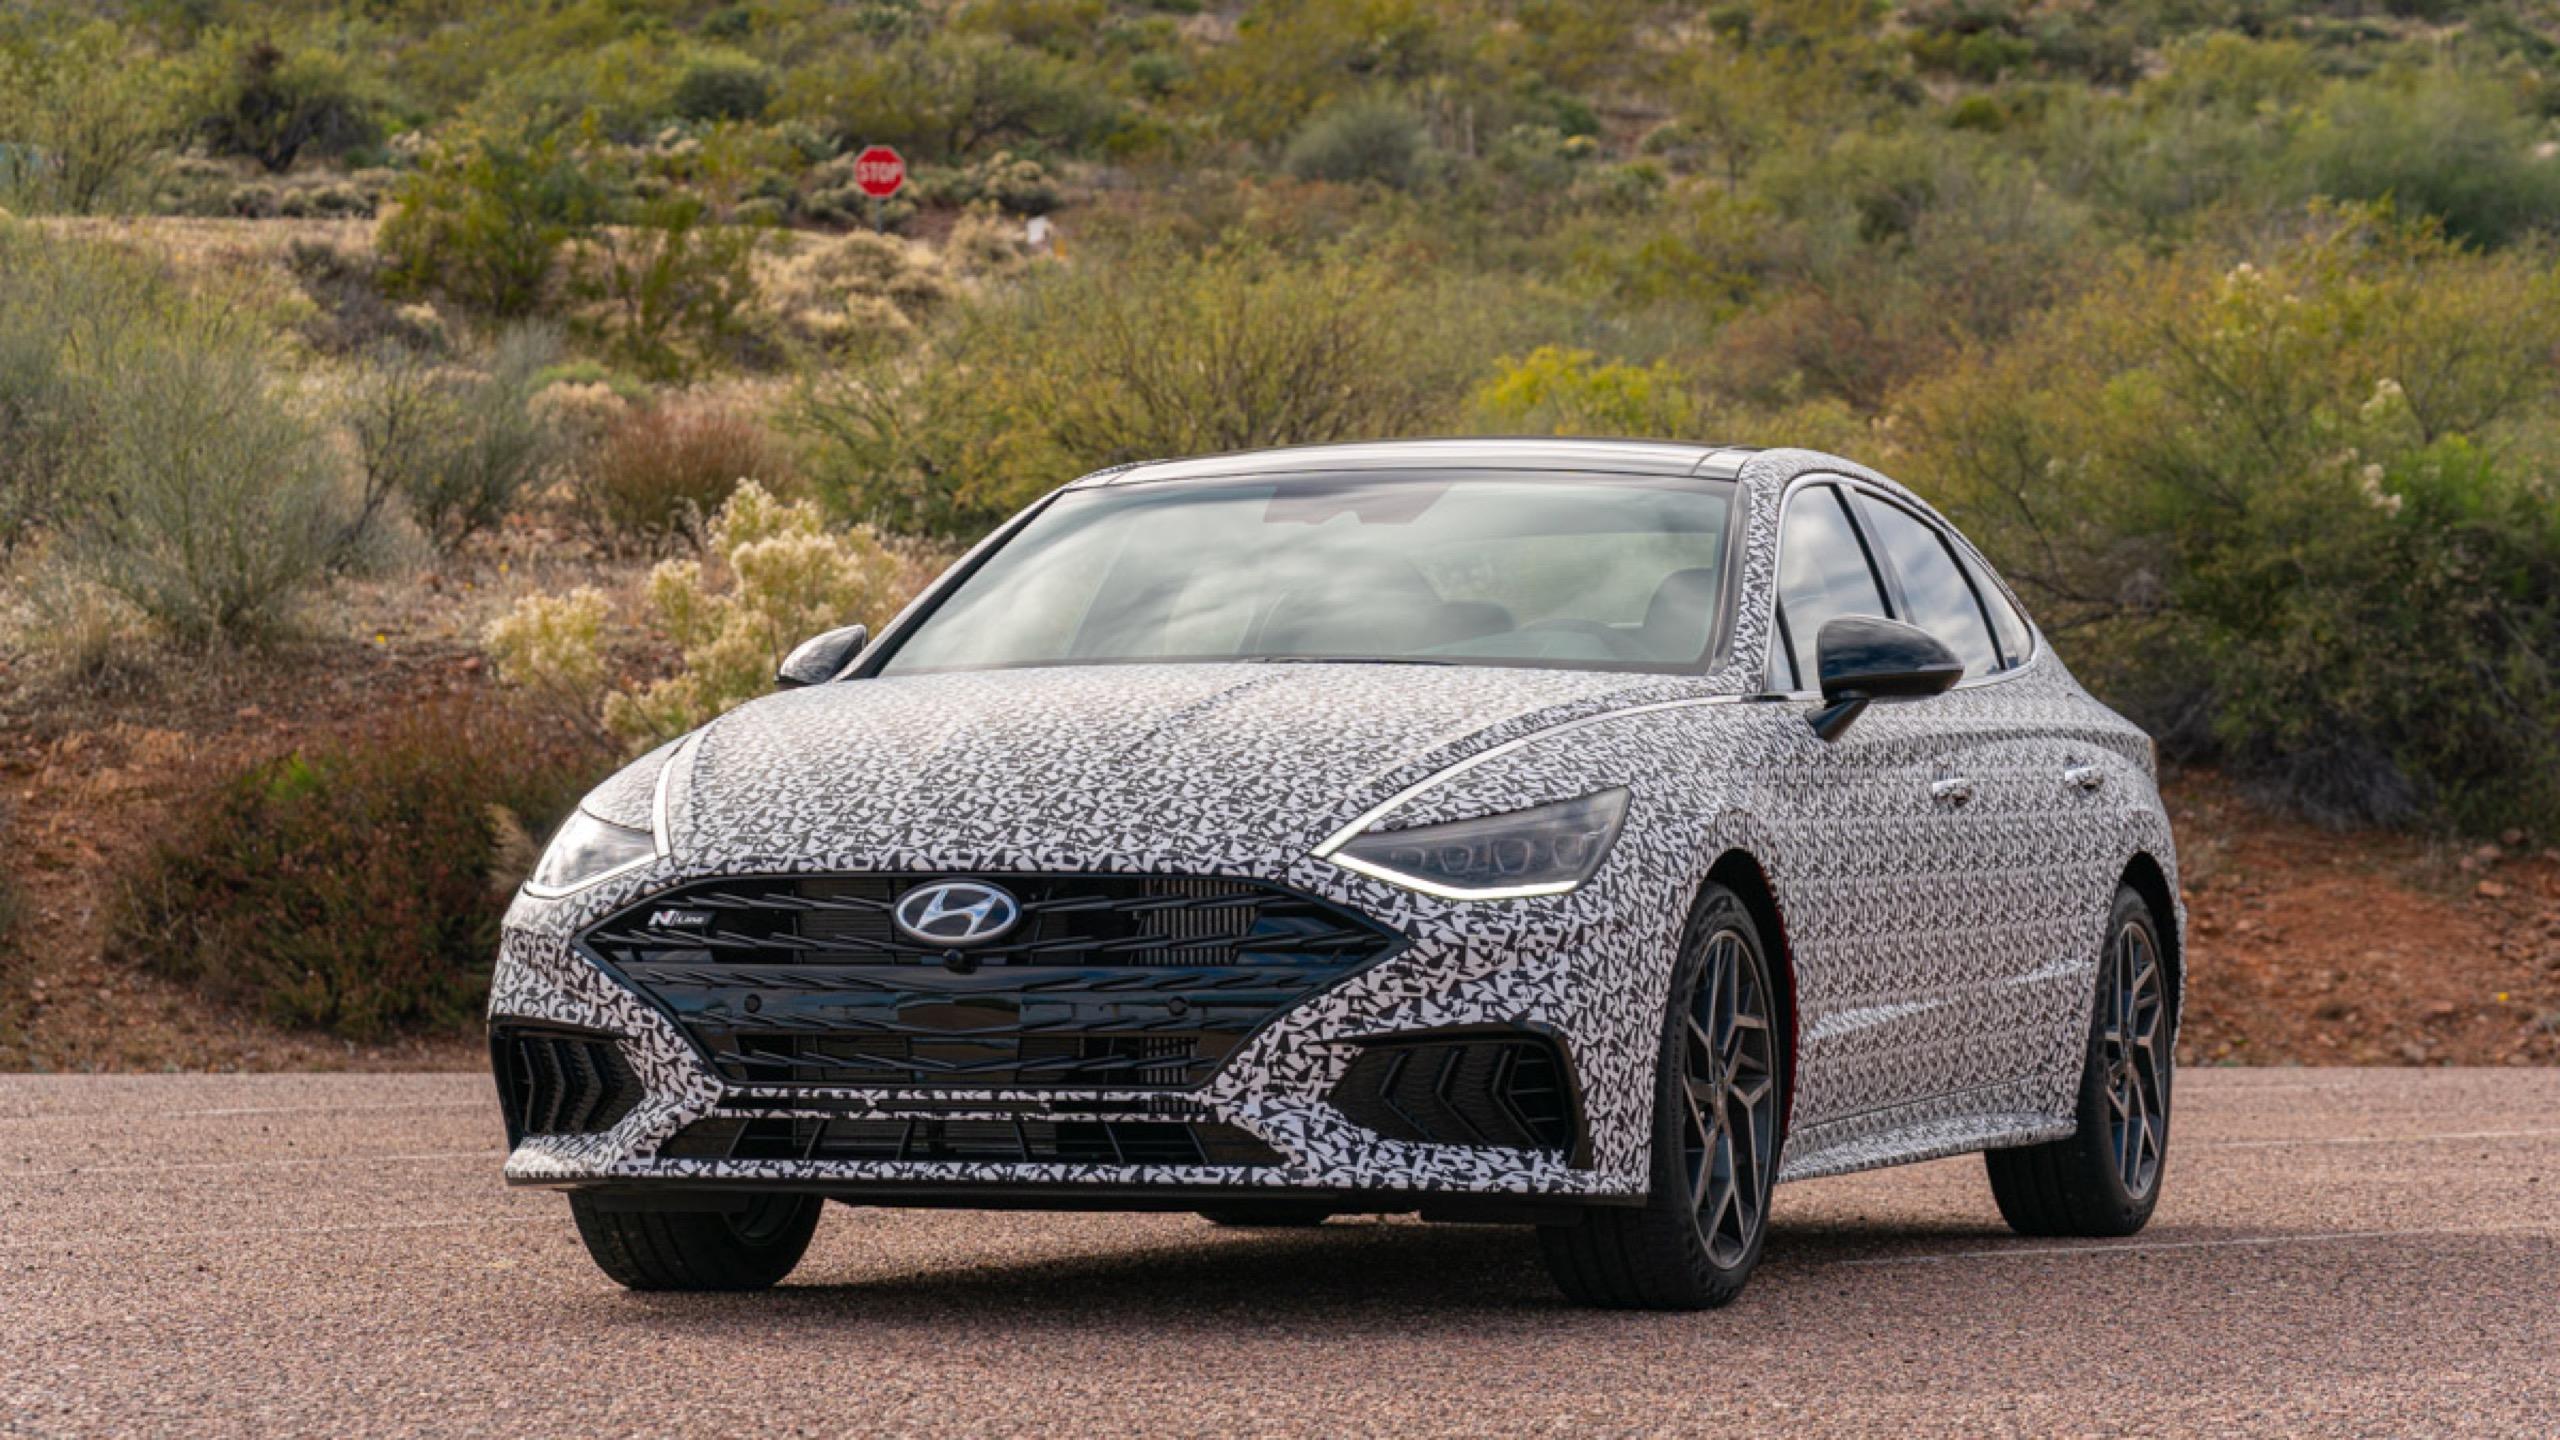 2021 Hyundai Sonata N Line Review Specs Photos Driving Impressions Autoblog